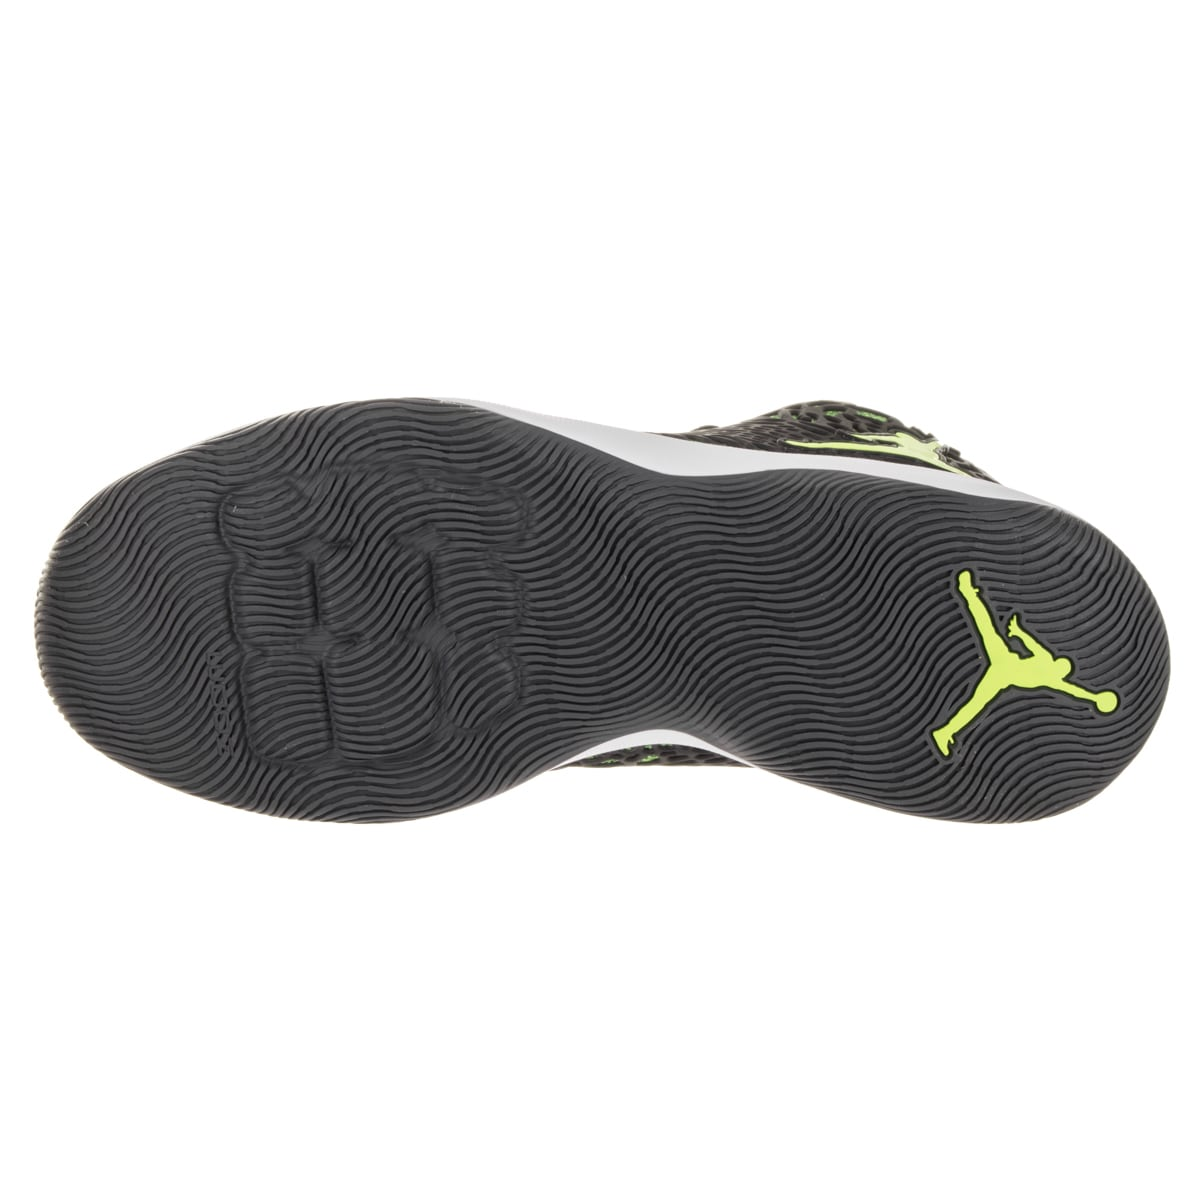 b8d519e6c3bb0 Shop Nike Jordan Men s Jordan Ultra.Fly Black Synthetic Leather Basketball  Shoes - Free Shipping Today - Overstock - 13620730